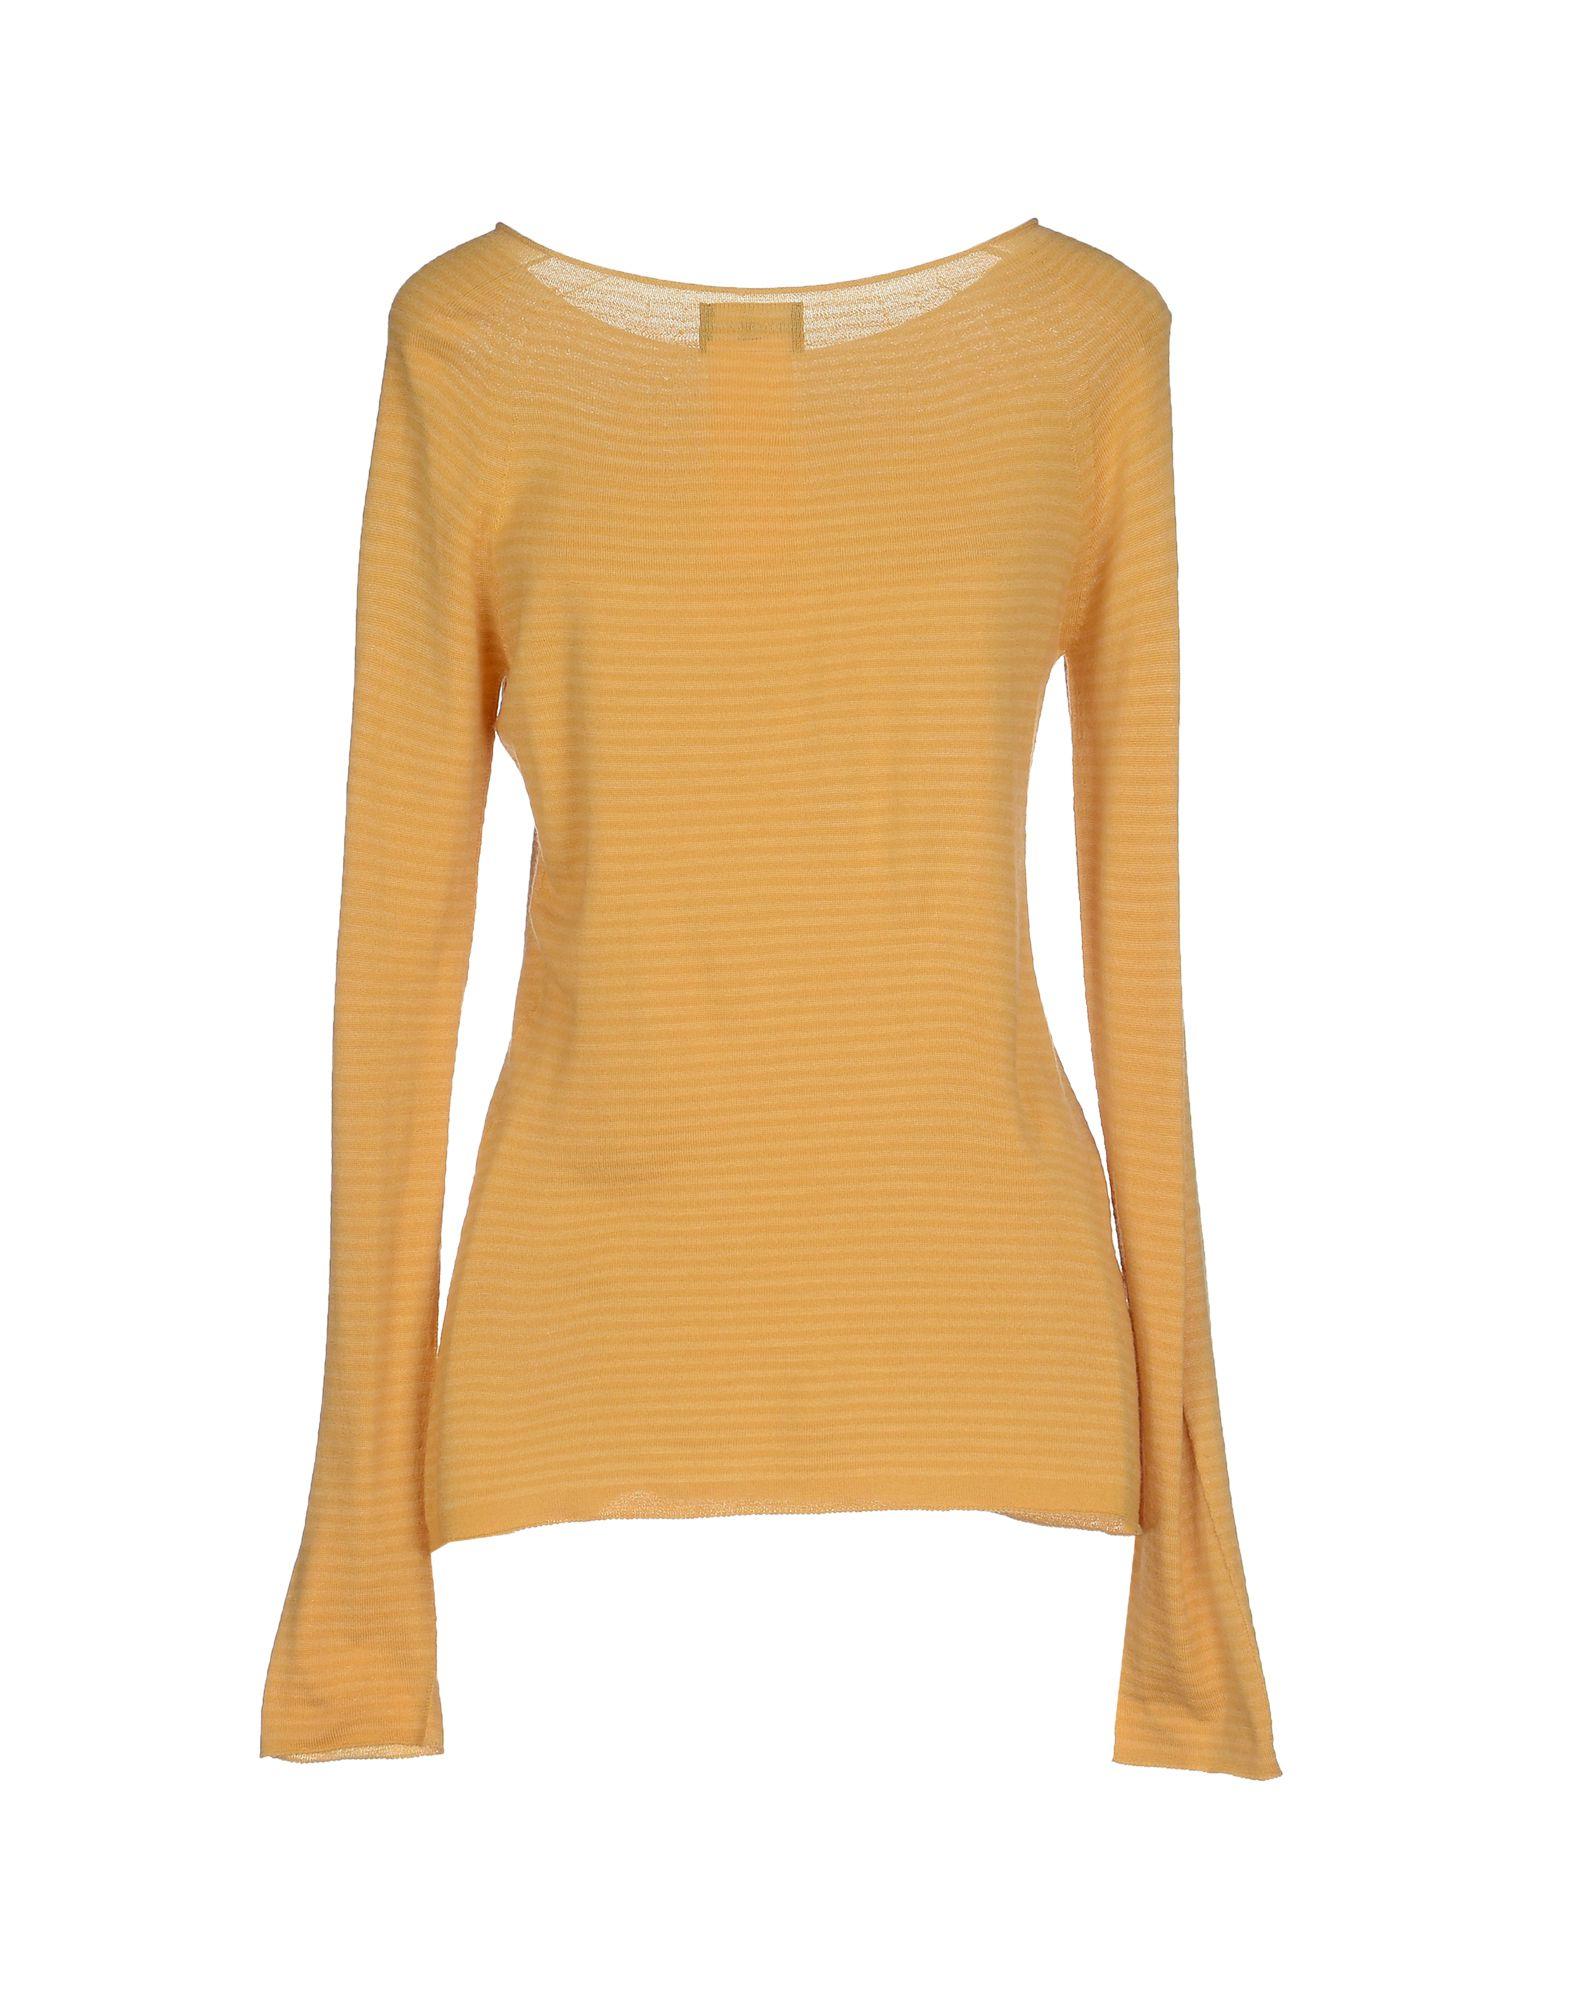 emporio armani sweater in orange lyst. Black Bedroom Furniture Sets. Home Design Ideas